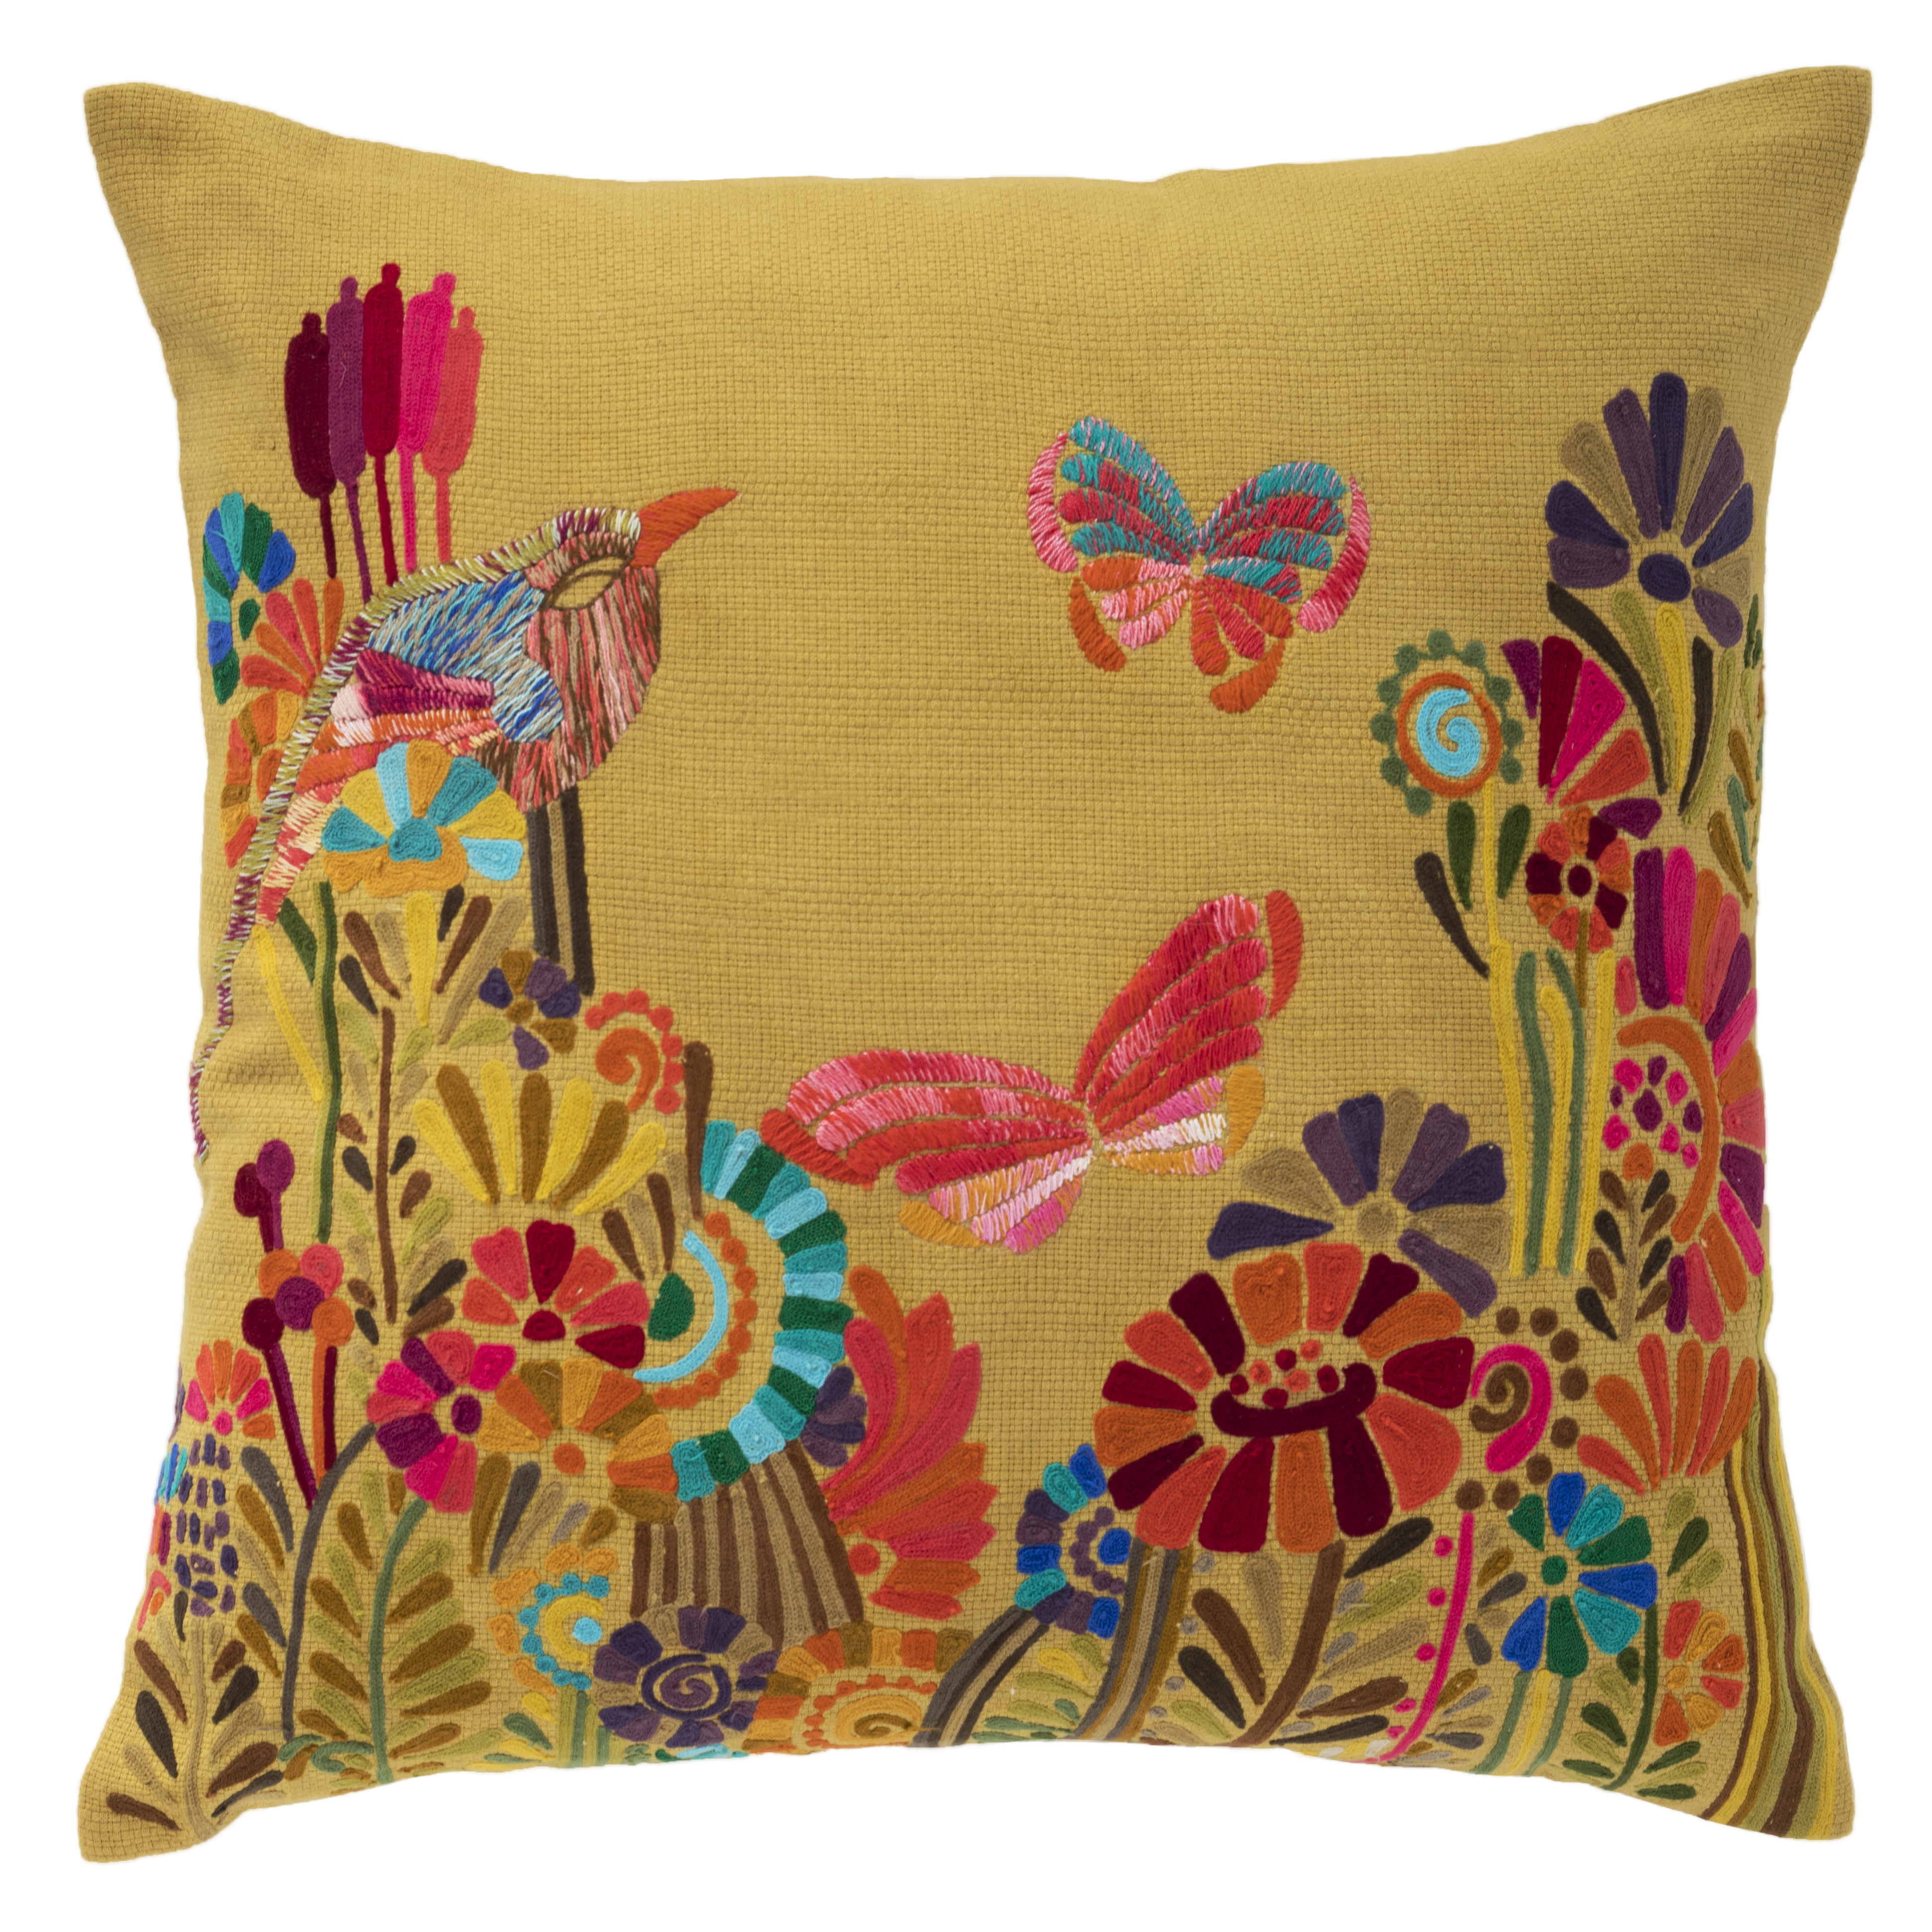 Annie Selke Botanica pillow